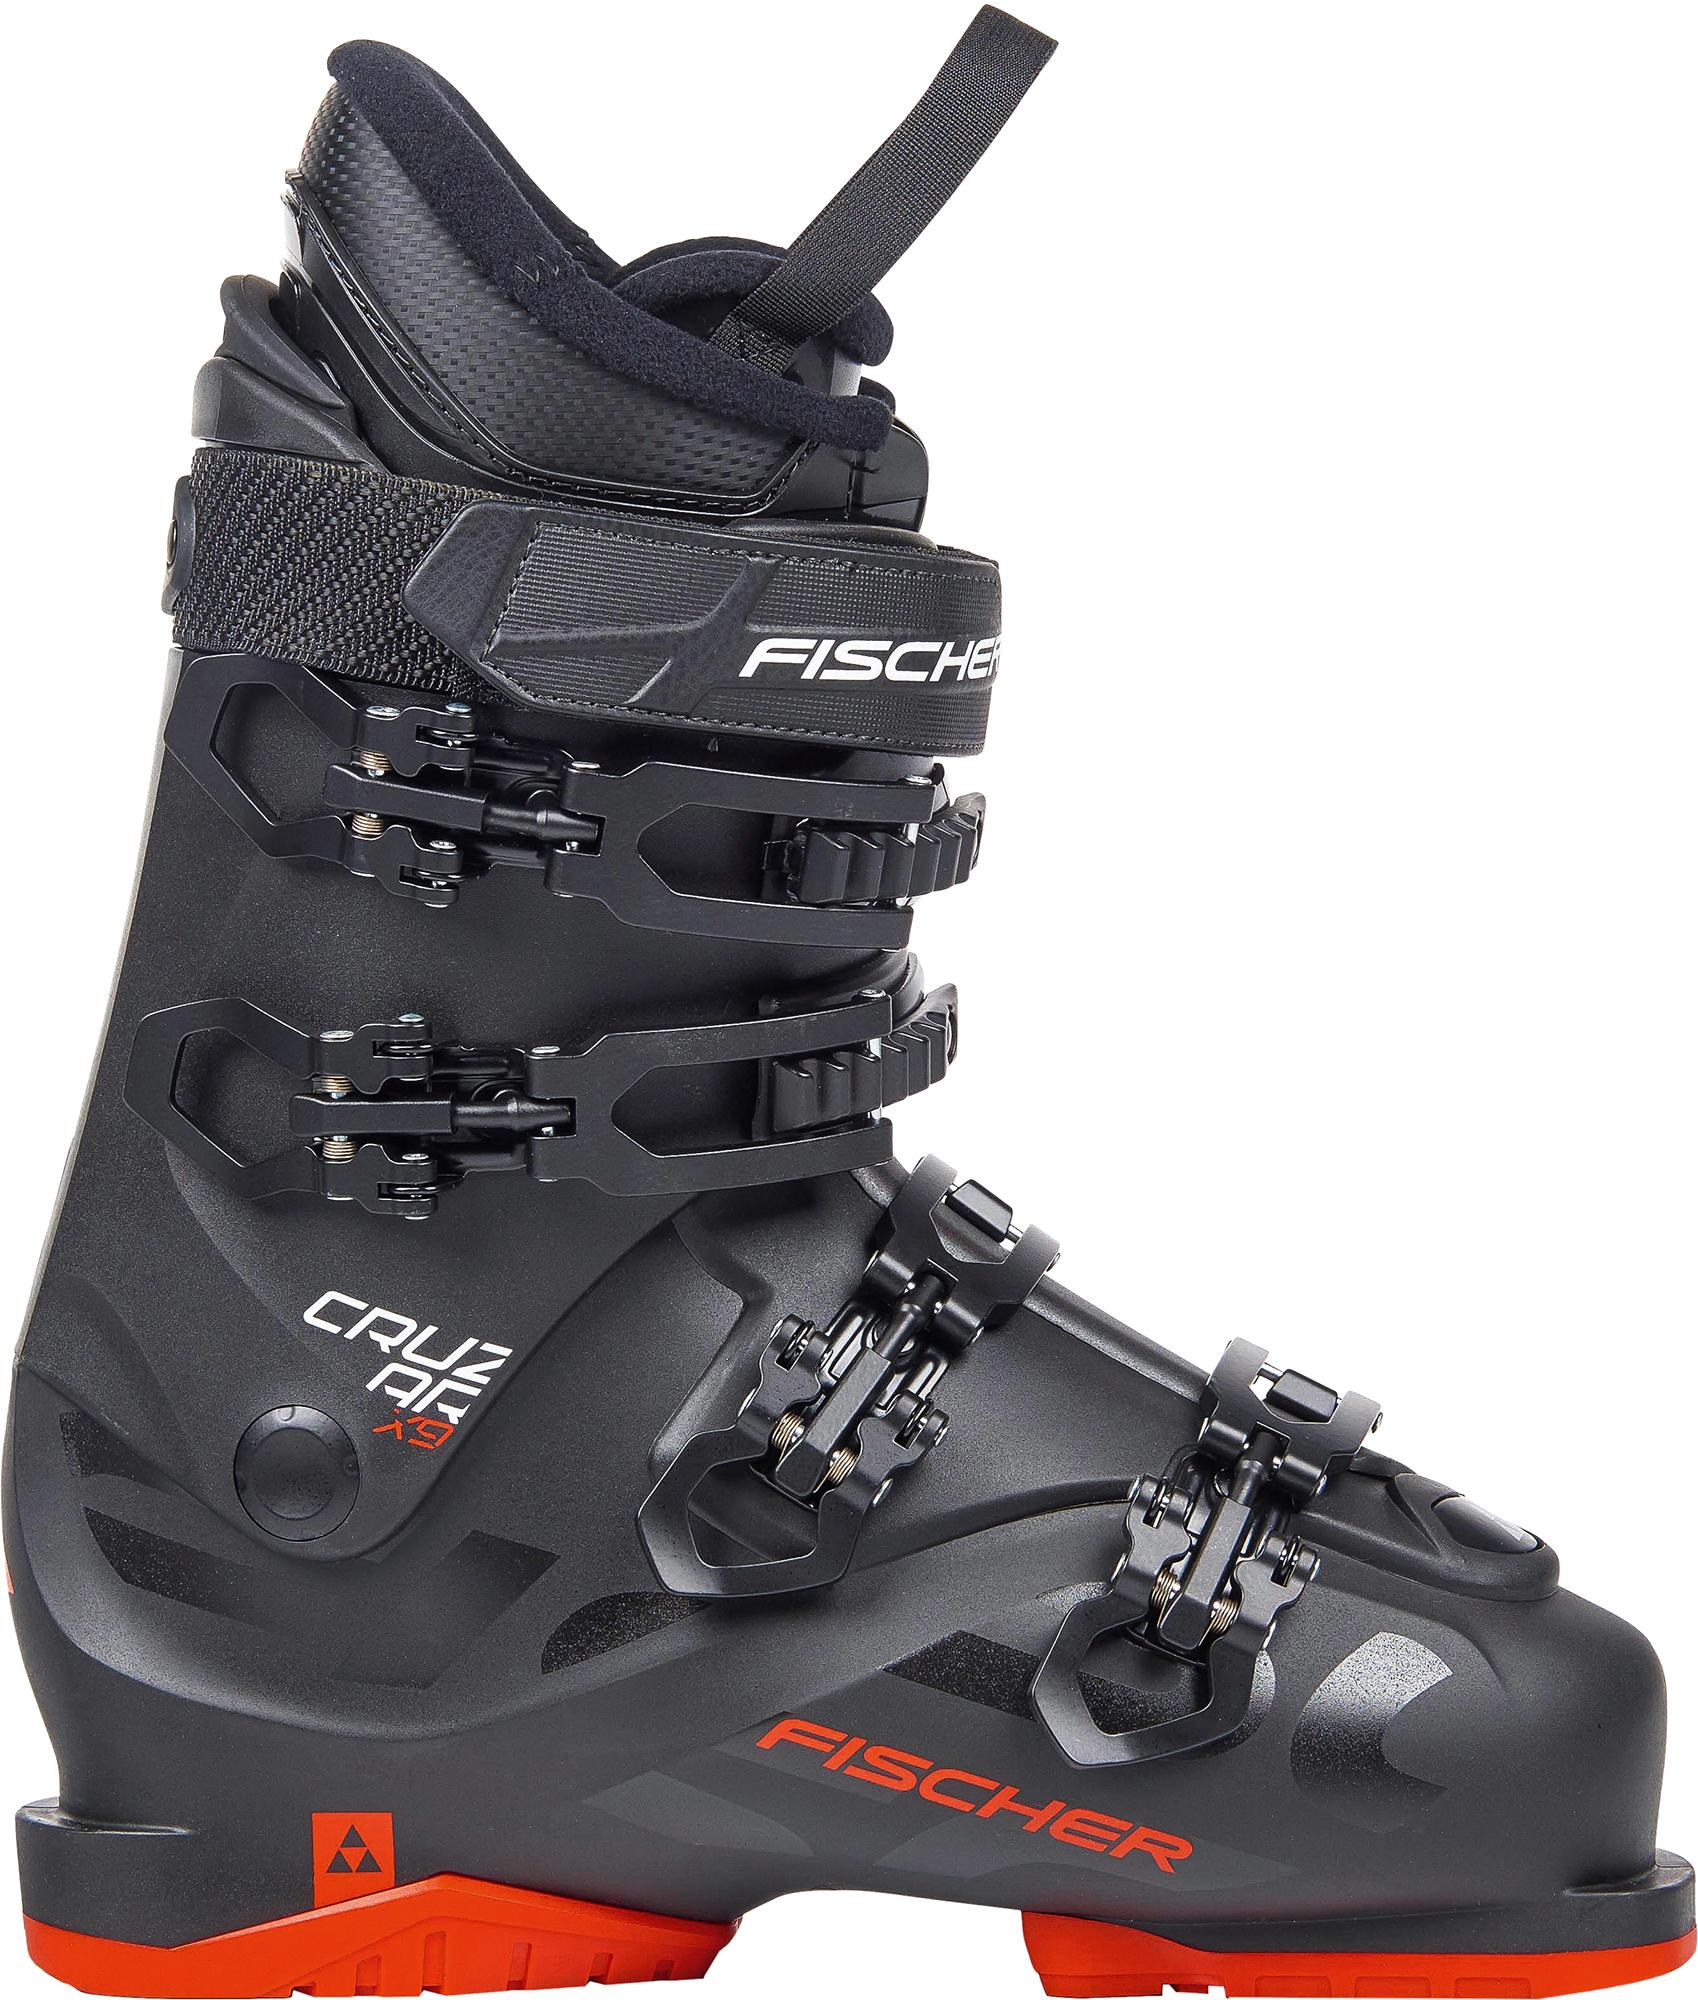 Fischer Ботинки горнолыжные CRUZAR X 9.0, размер 31,5 см